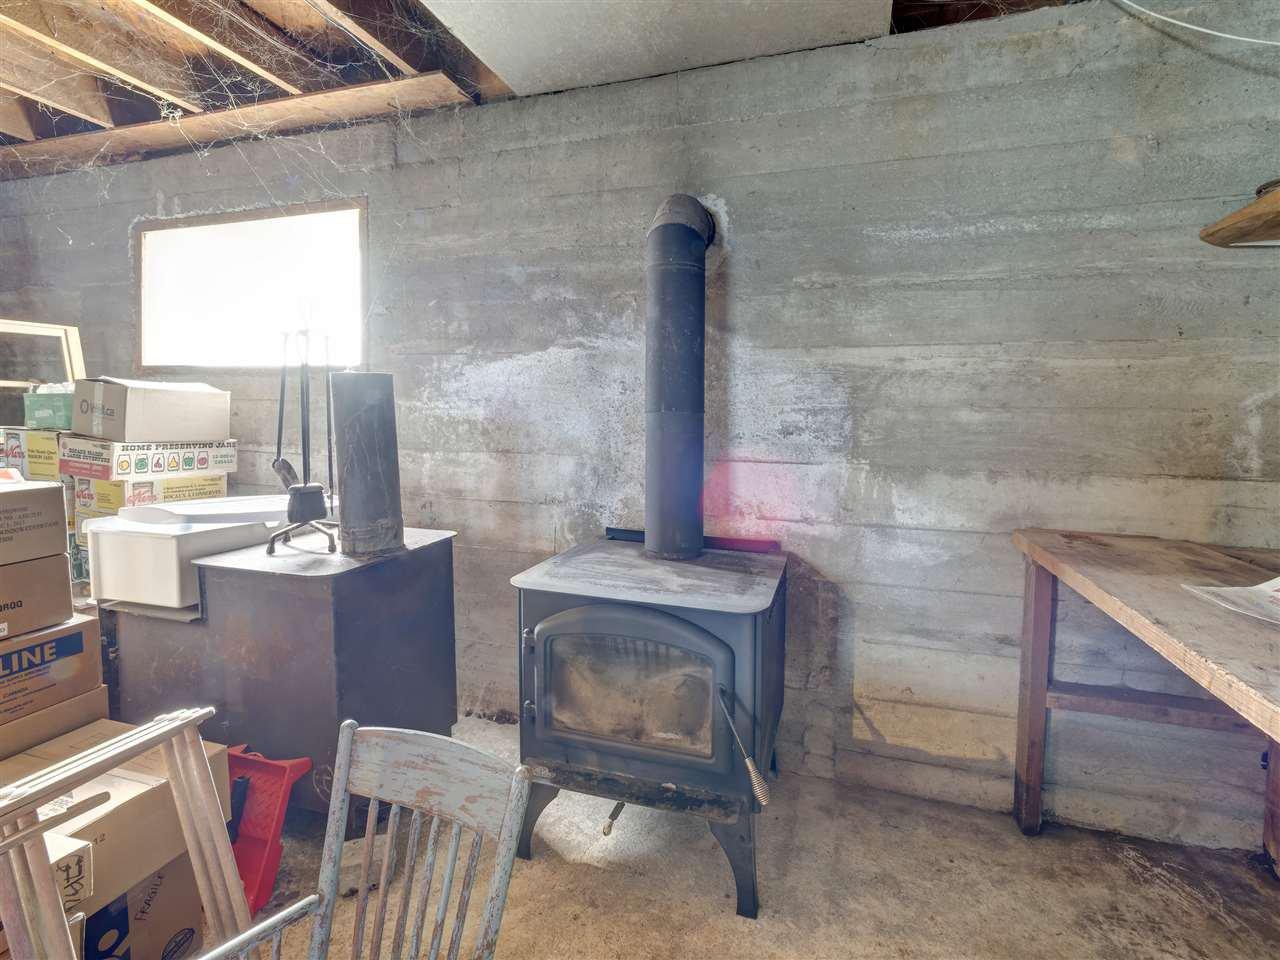 Photo 20: Photos: 5761 MCLAUGHAN Road in Sechelt: Sechelt District House for sale (Sunshine Coast)  : MLS®# R2479077